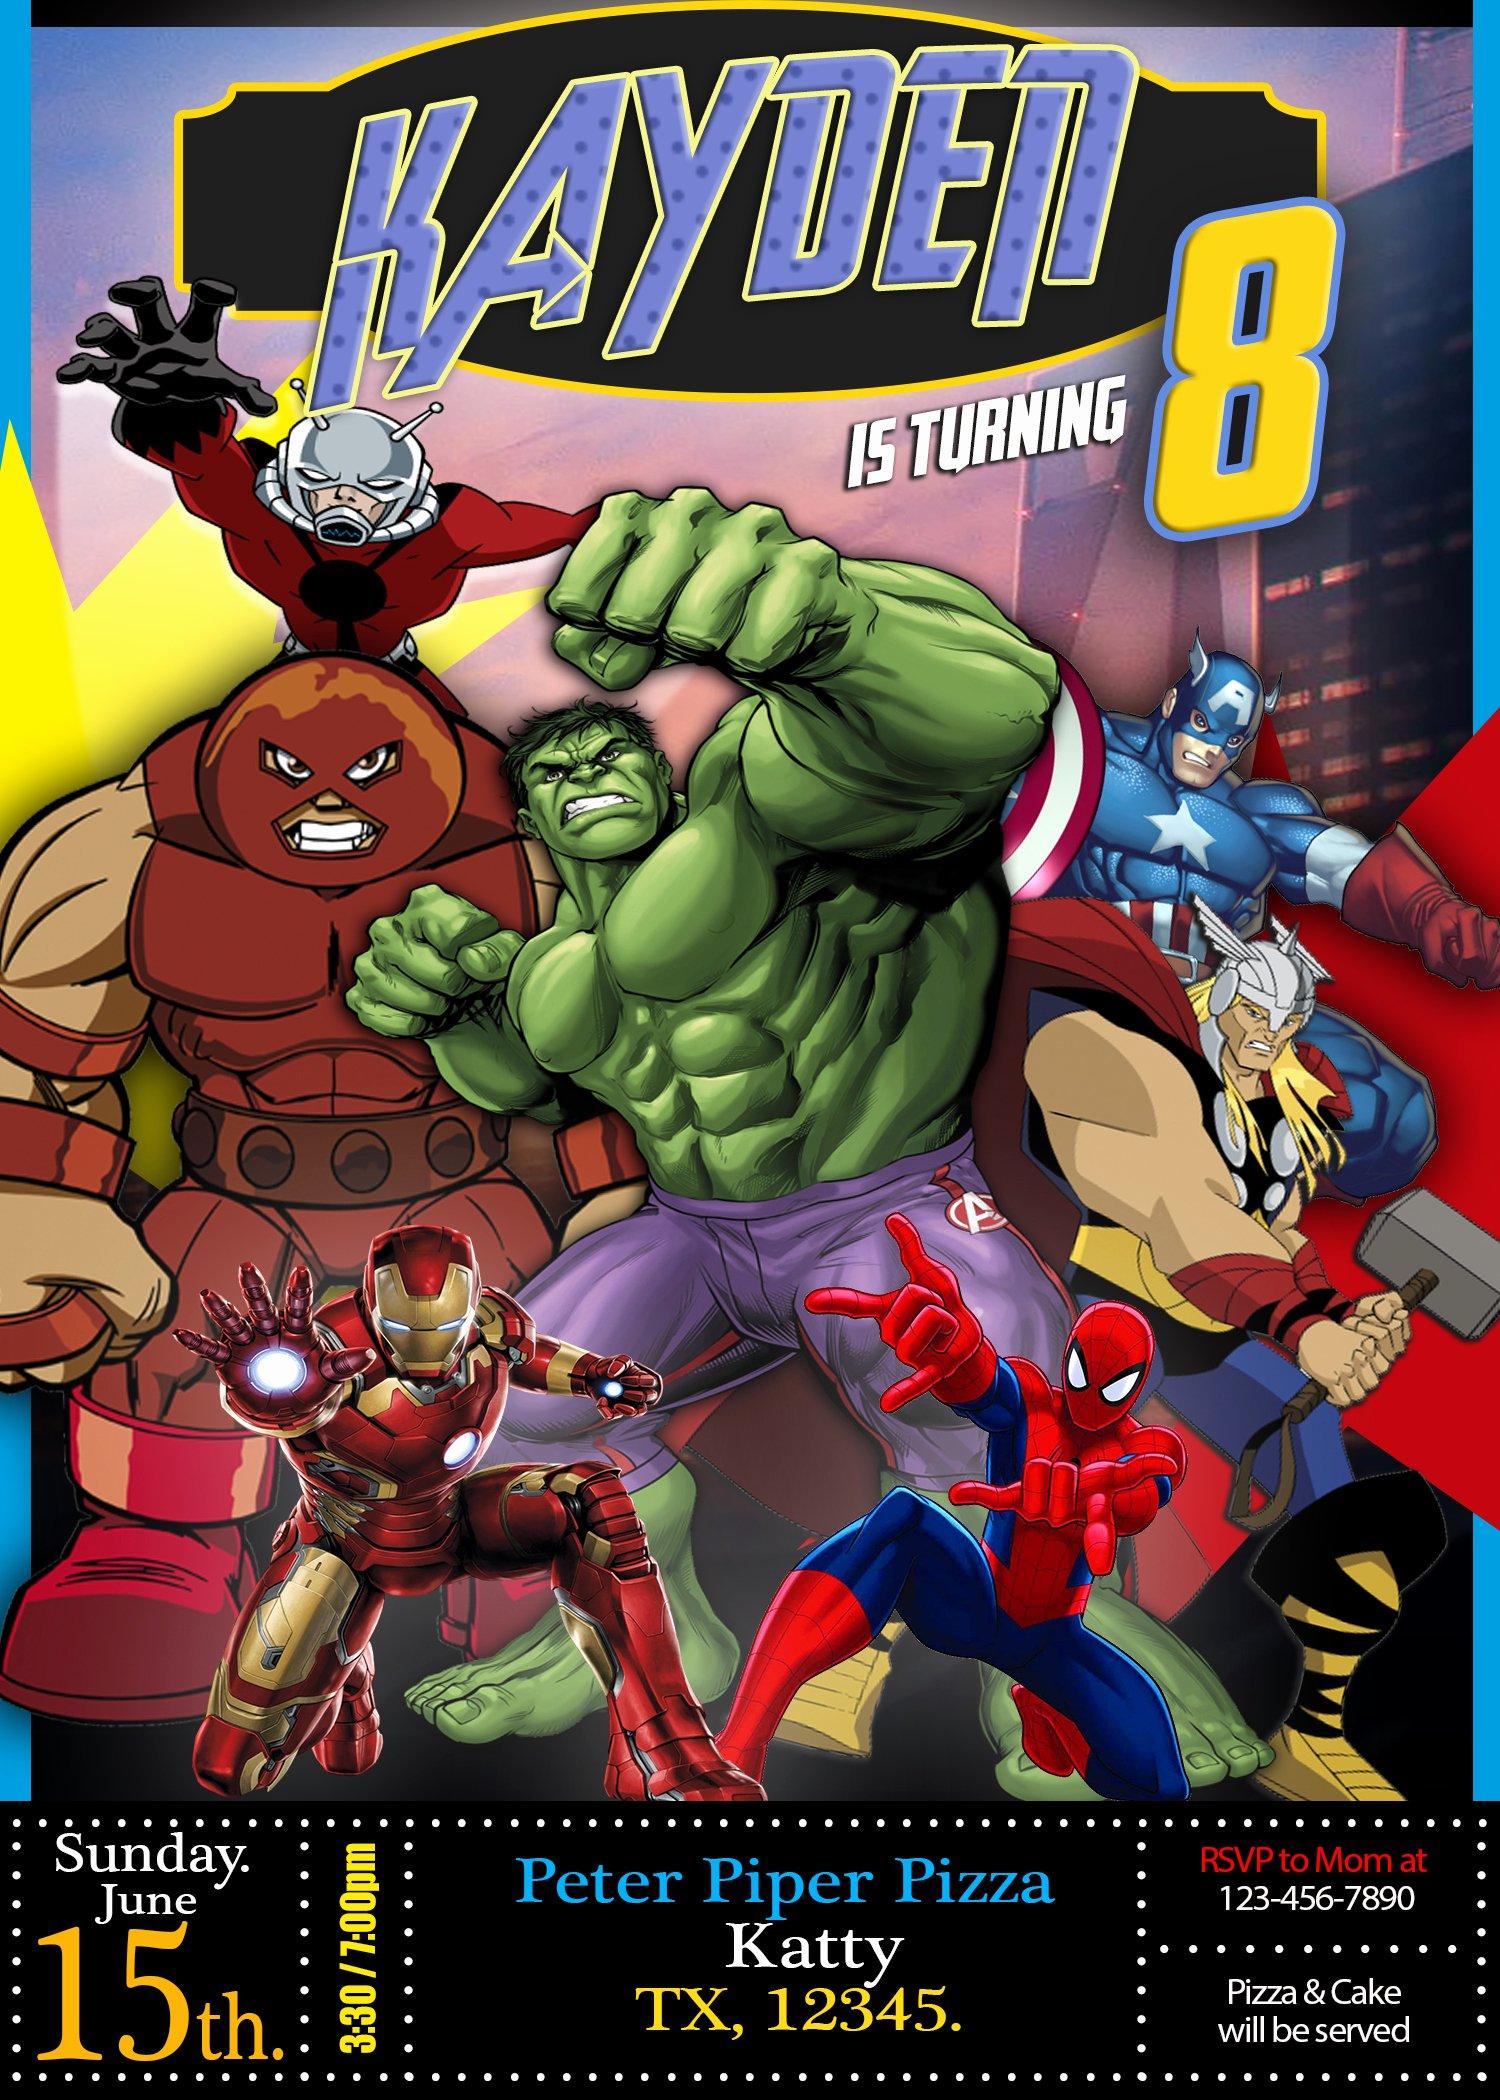 Avengers Birthday Invitations Custom Fresh Marvel Avengers Ics Birthday Invitation Oscarsitosroom